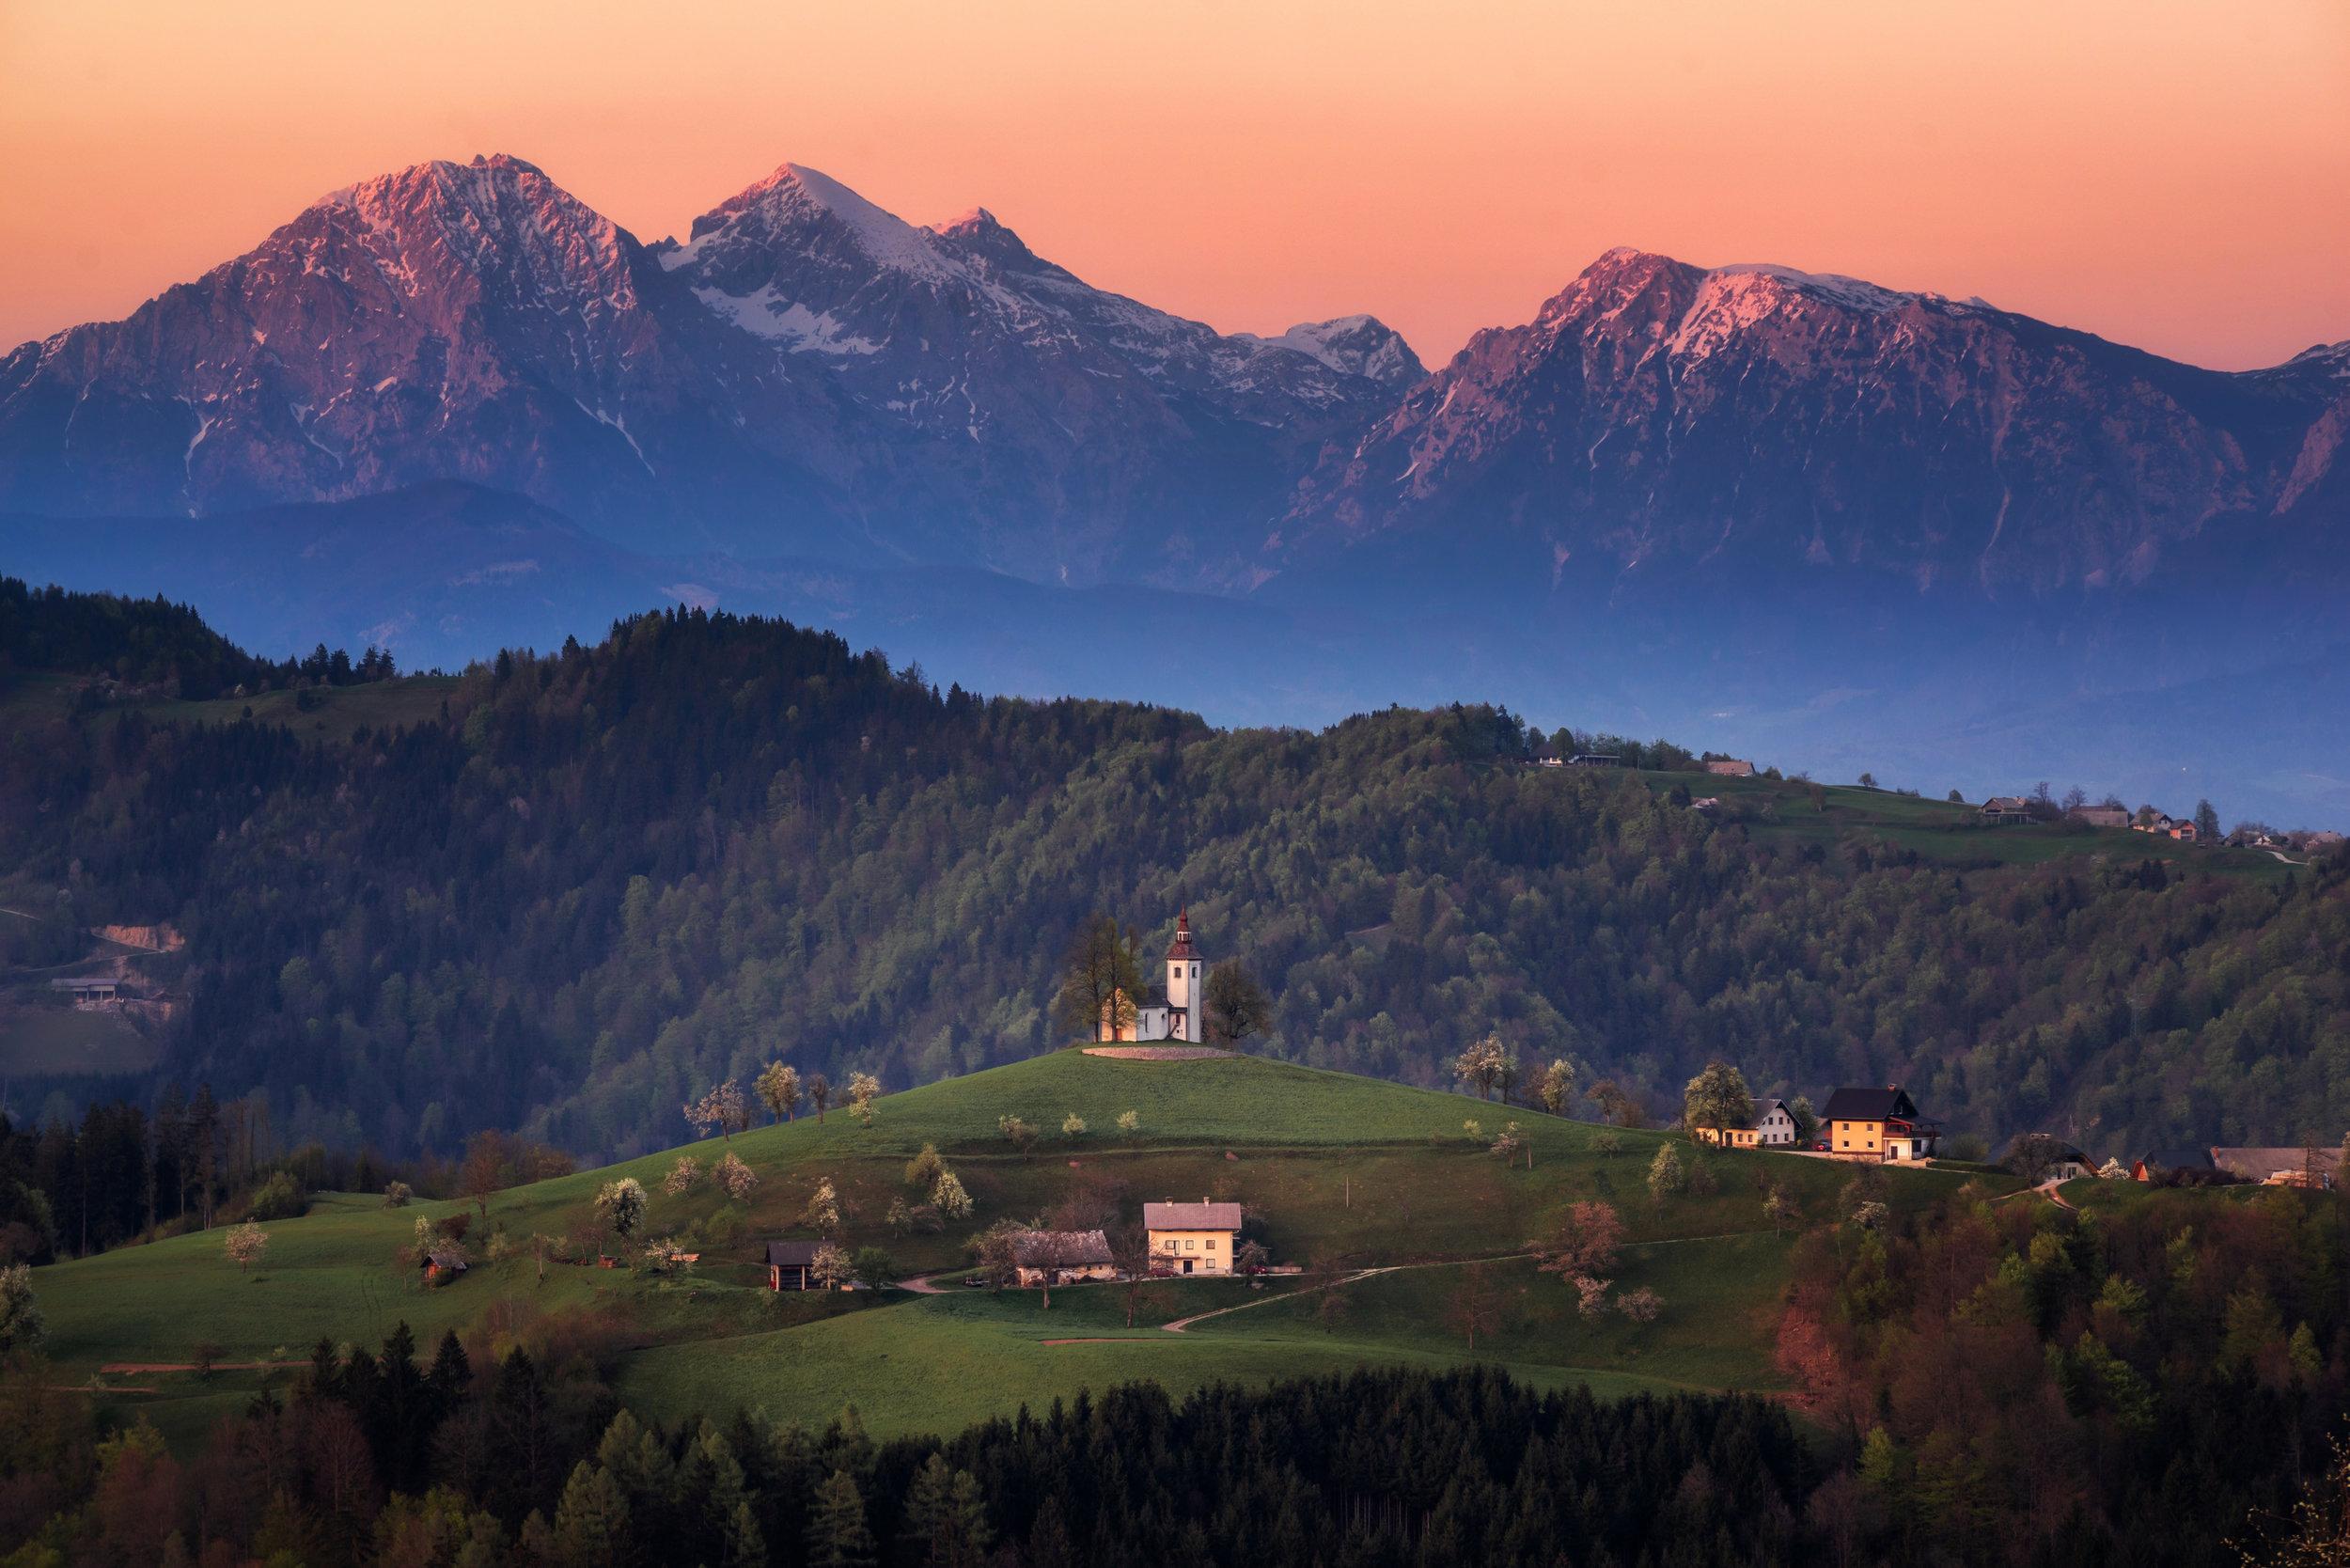 Good evening - Slovenia 2019